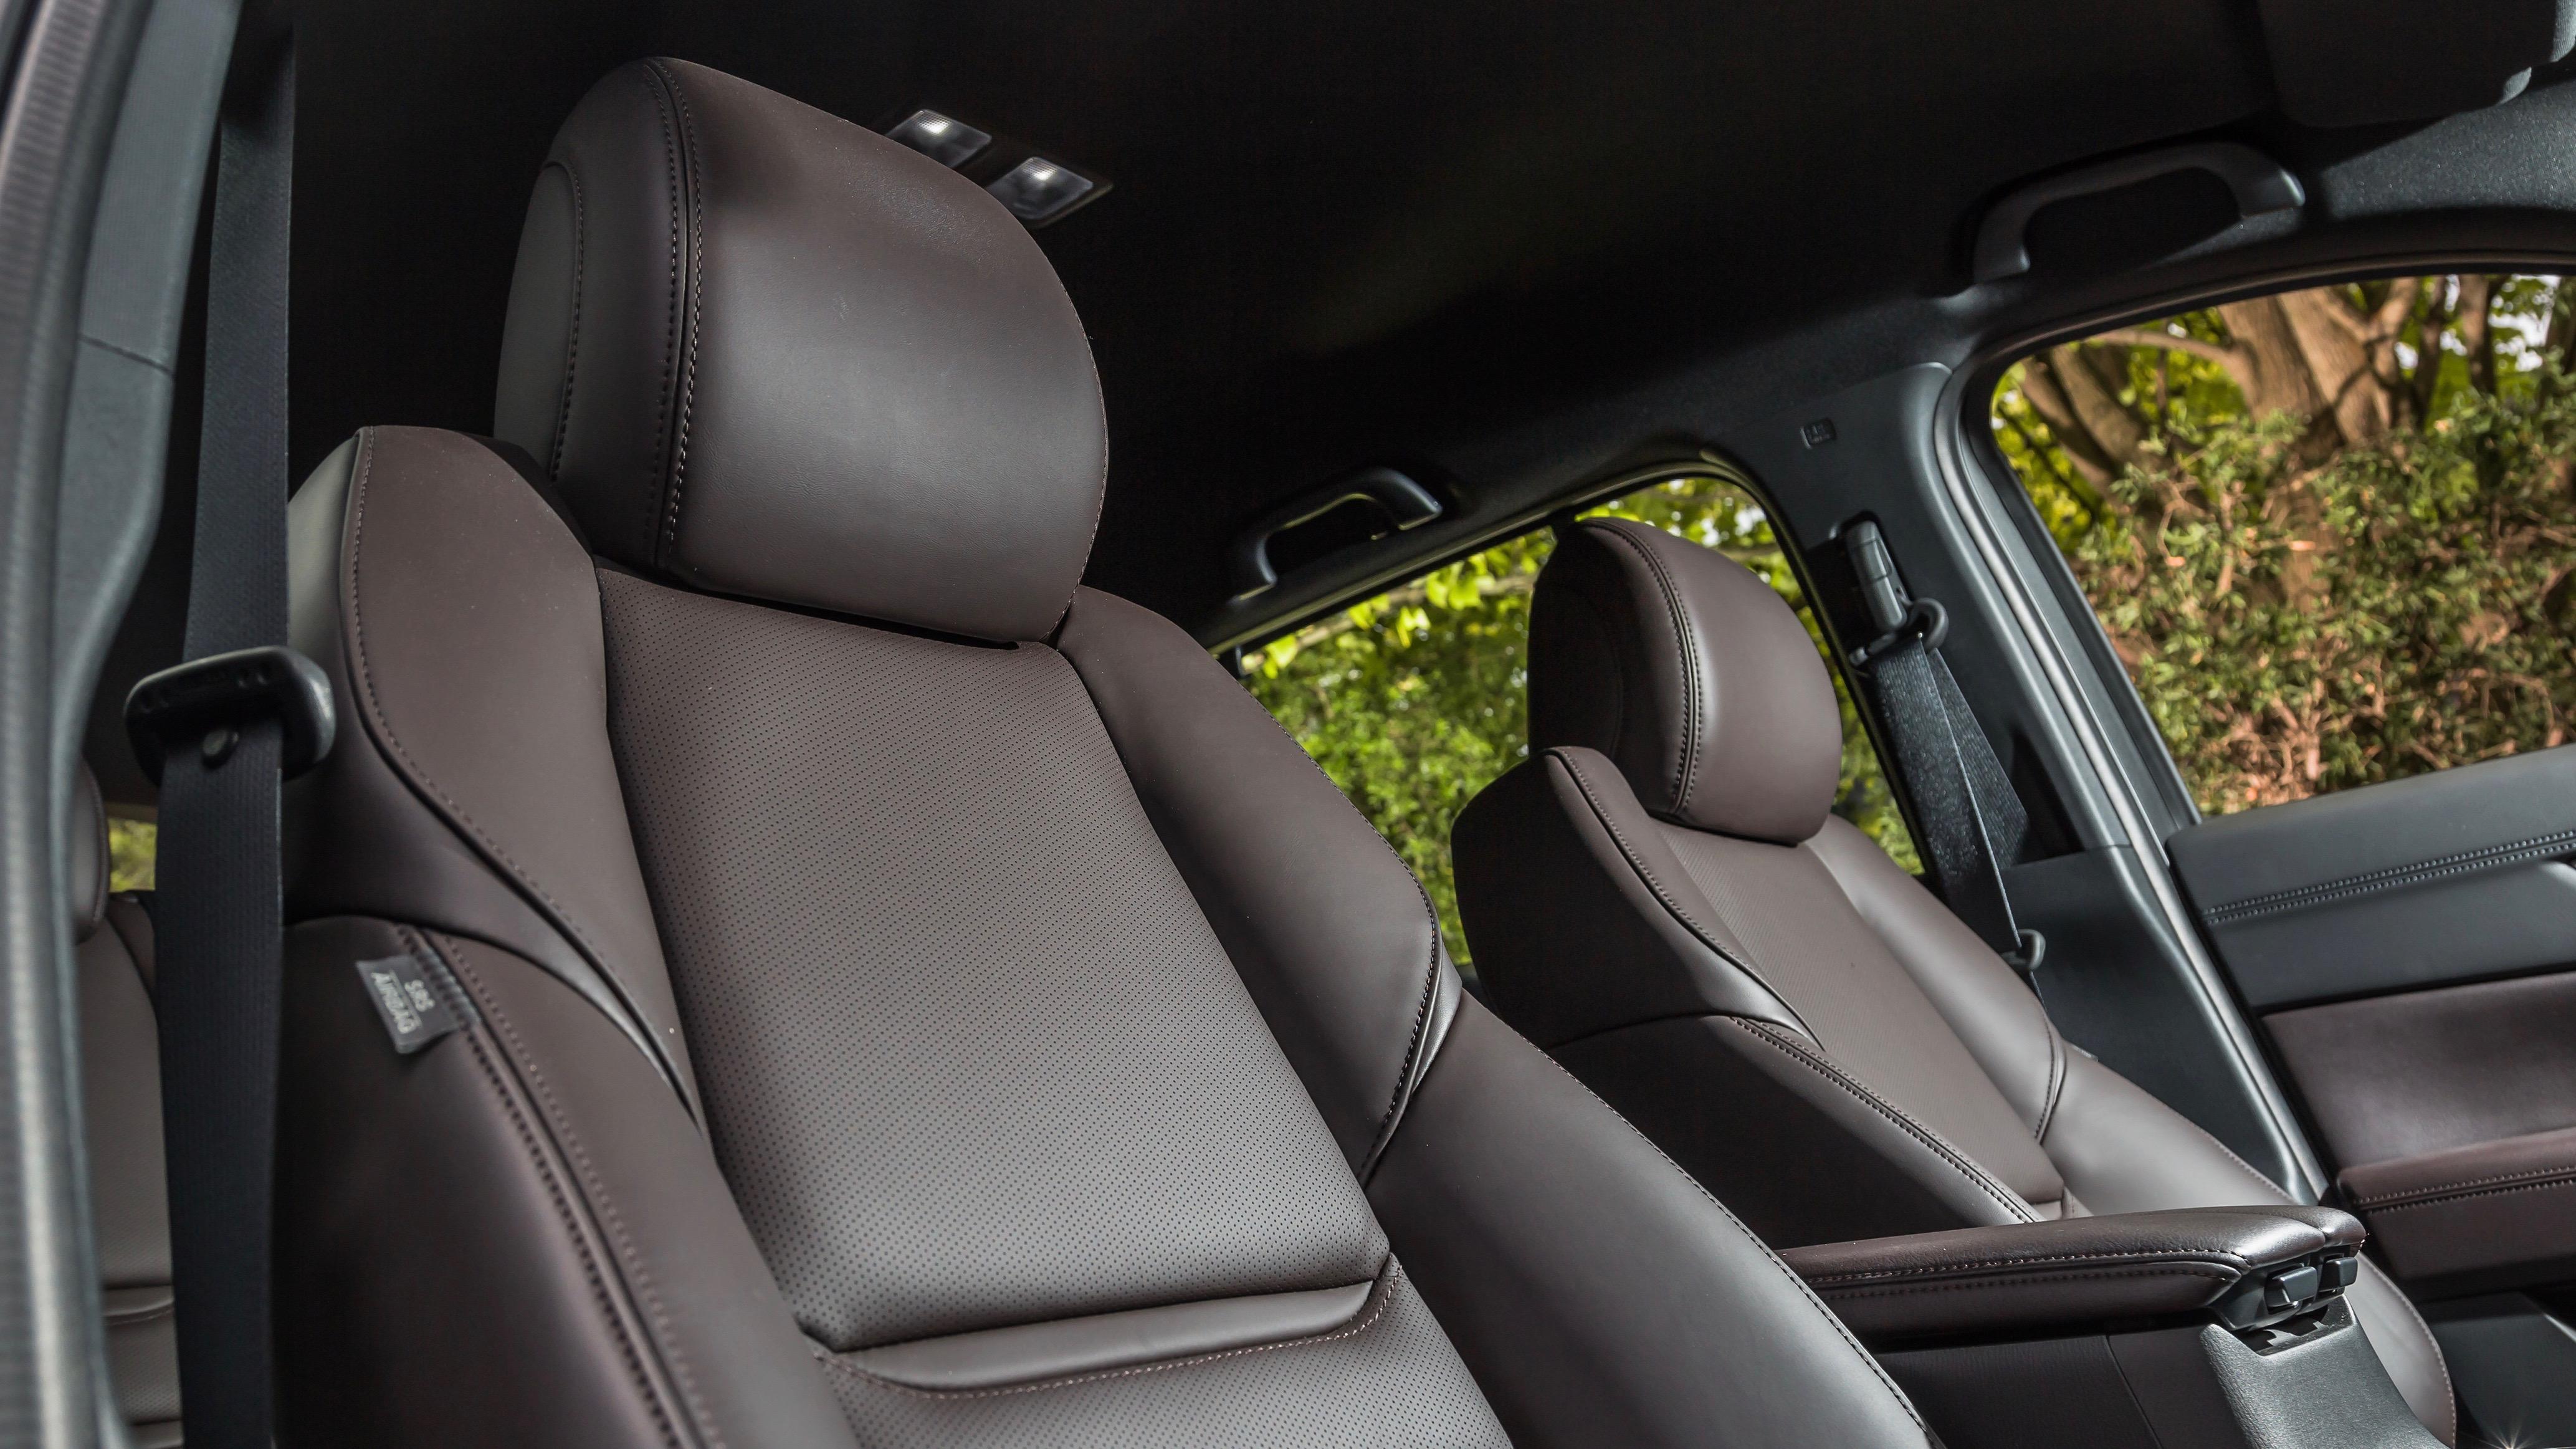 2018 Mazda CX-8 Asaki front seat